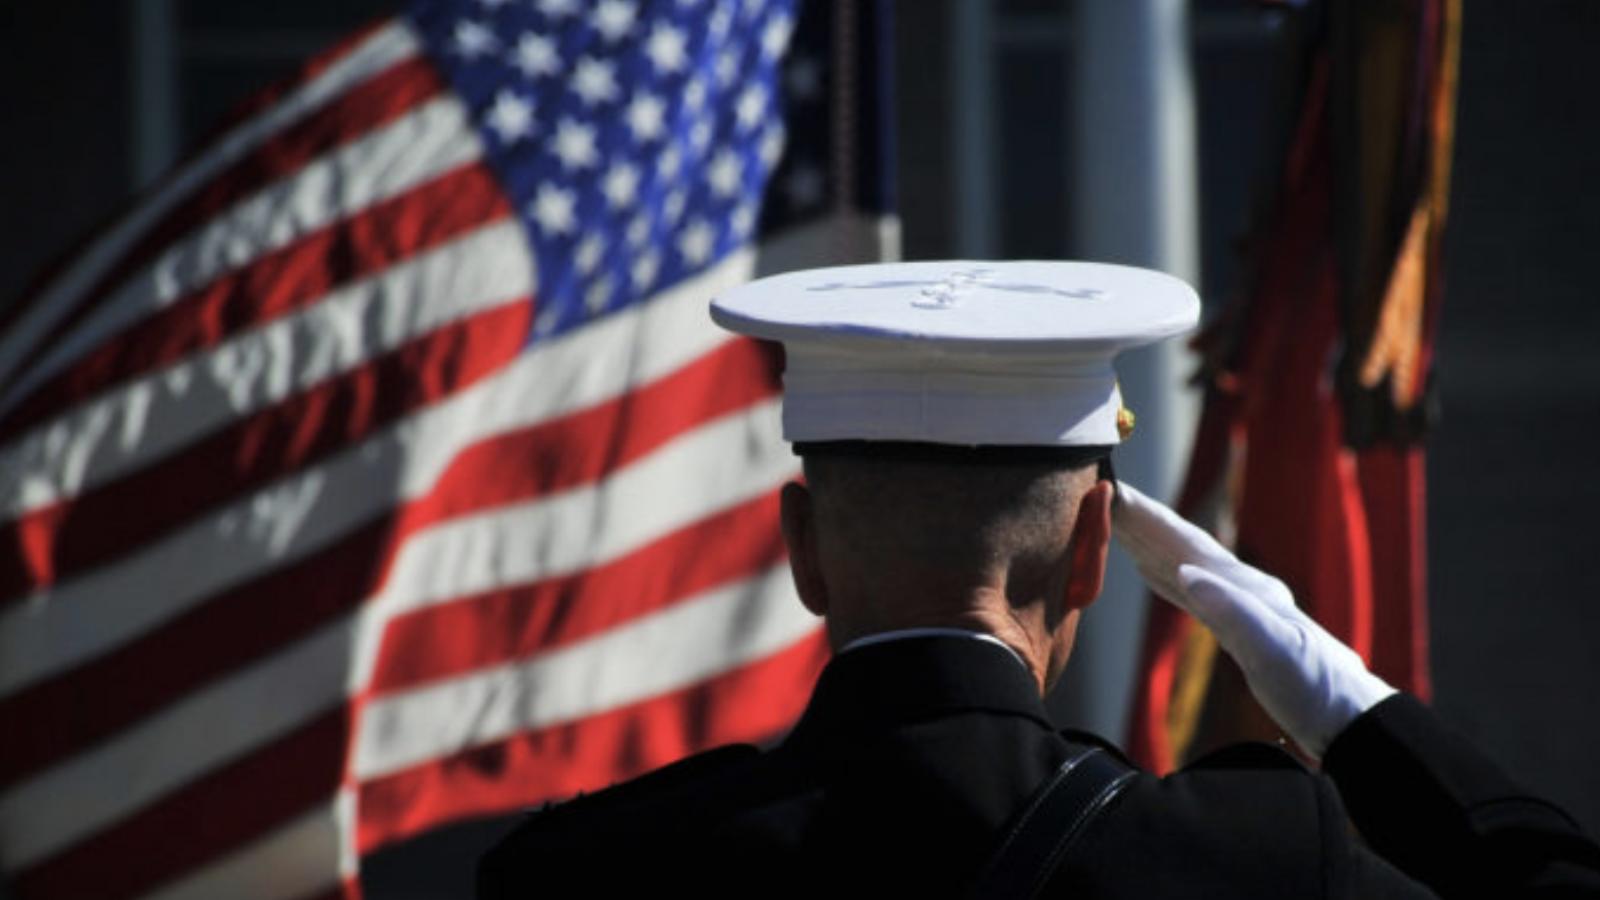 A man in a military uniform salutes U.S. flags